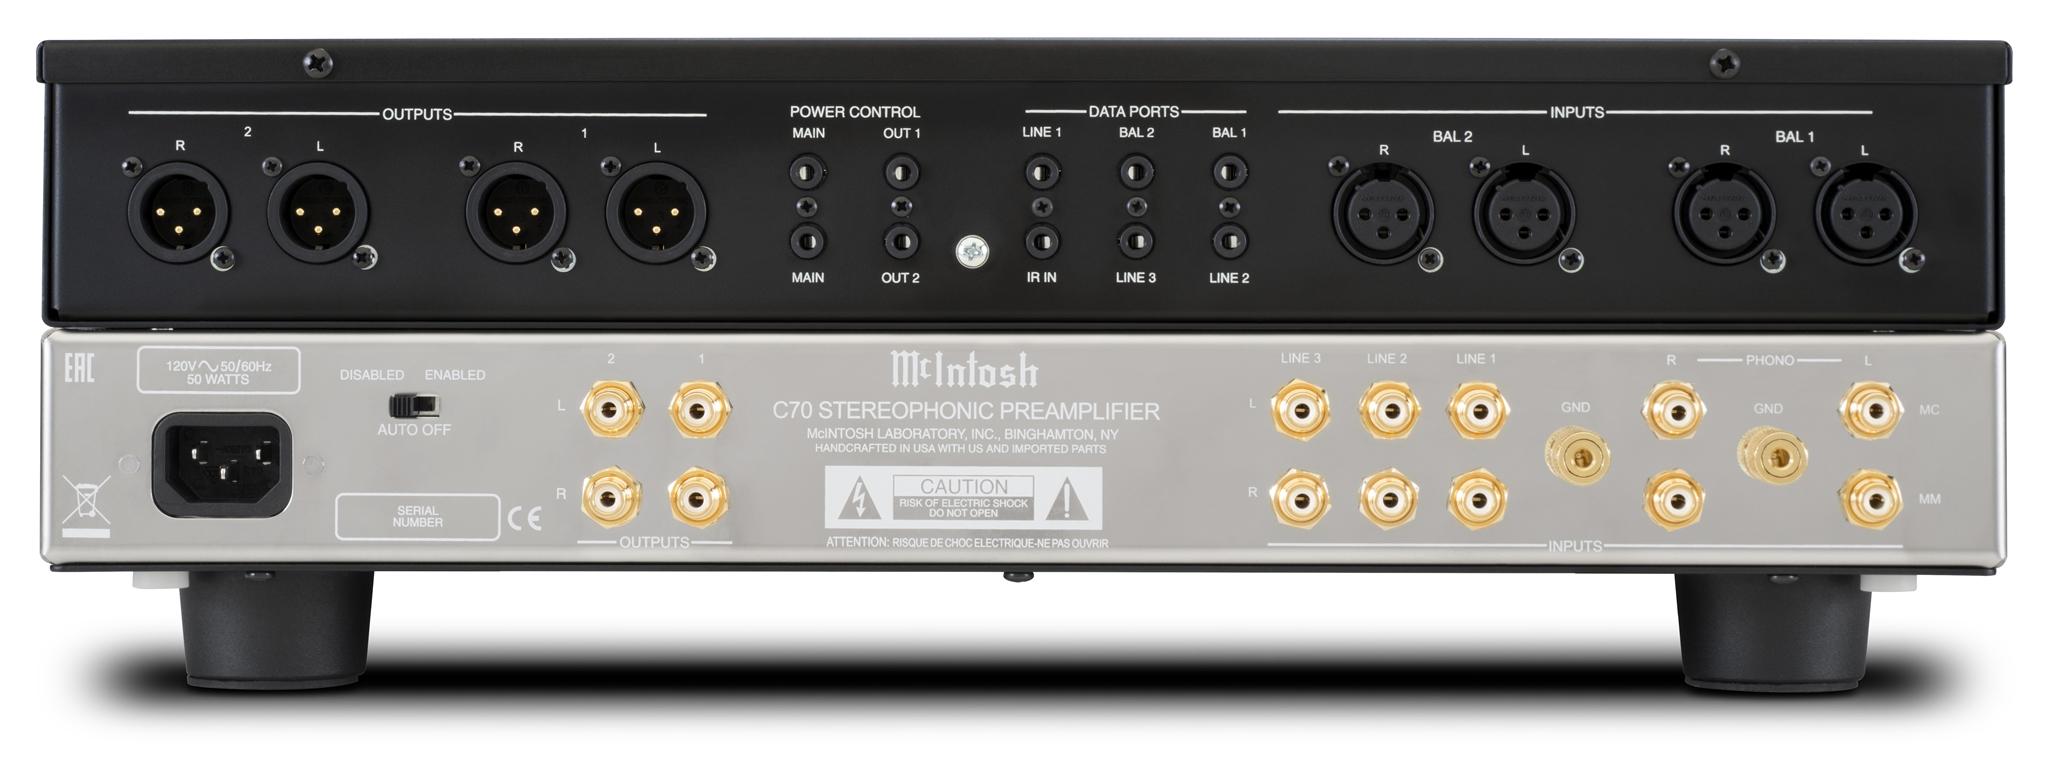 tinhte-mcintosh-MC2152-C70-limited-edition-1 (9).jpg